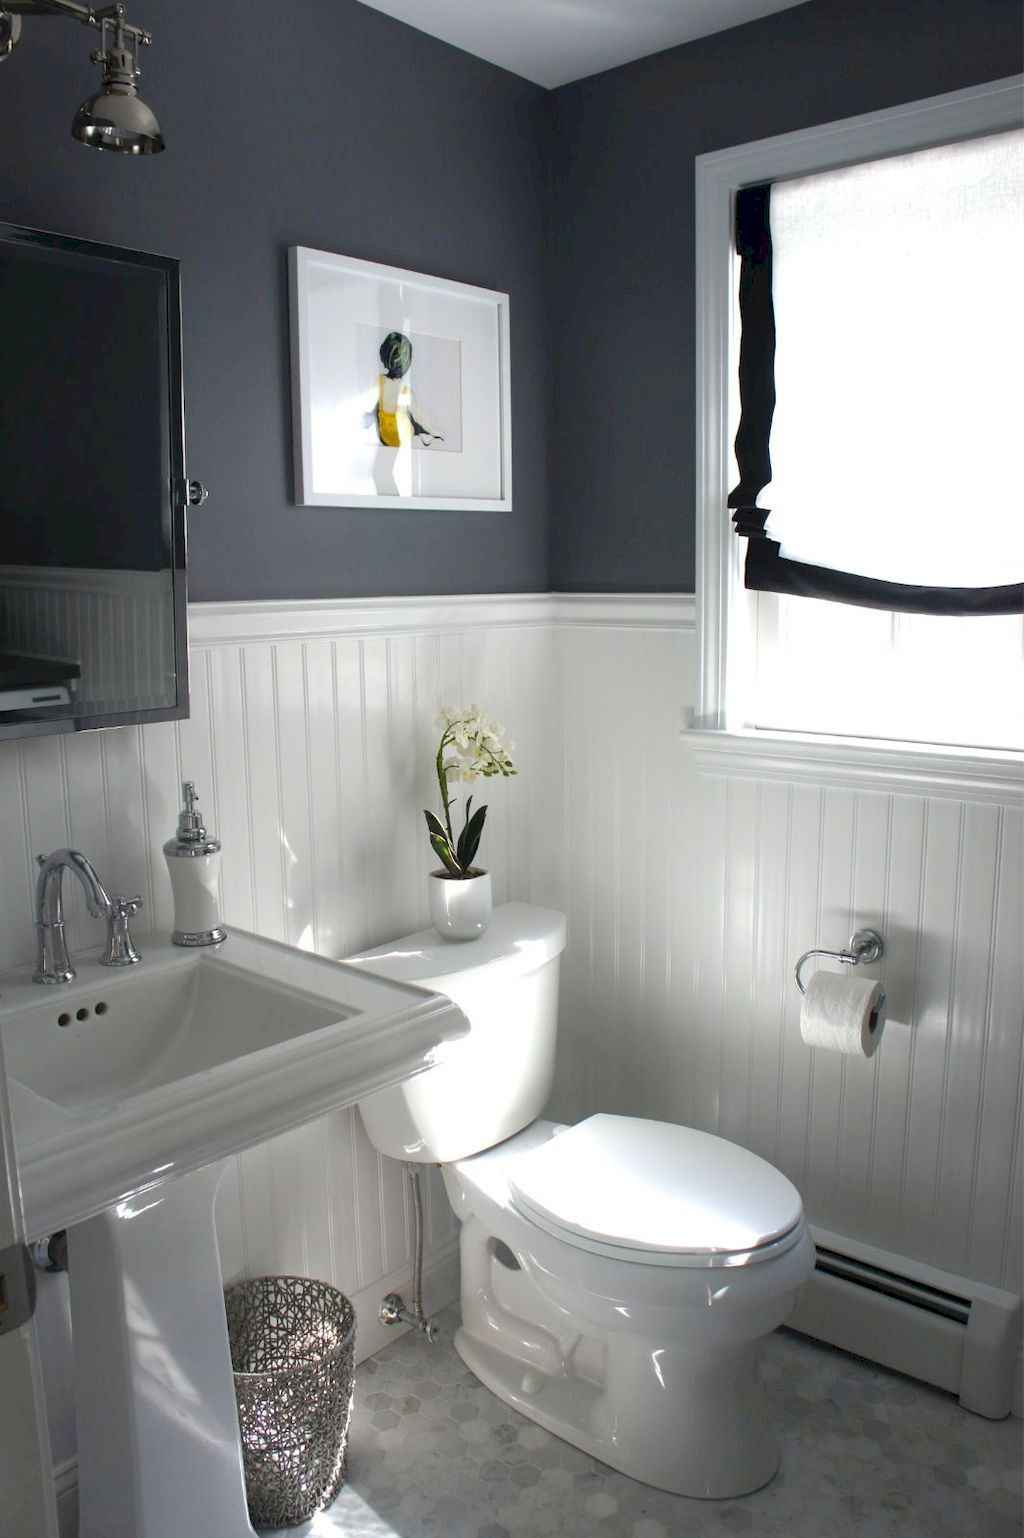 111 Brilliant Small Bathroom Remodel Ideas On A Budget (66)